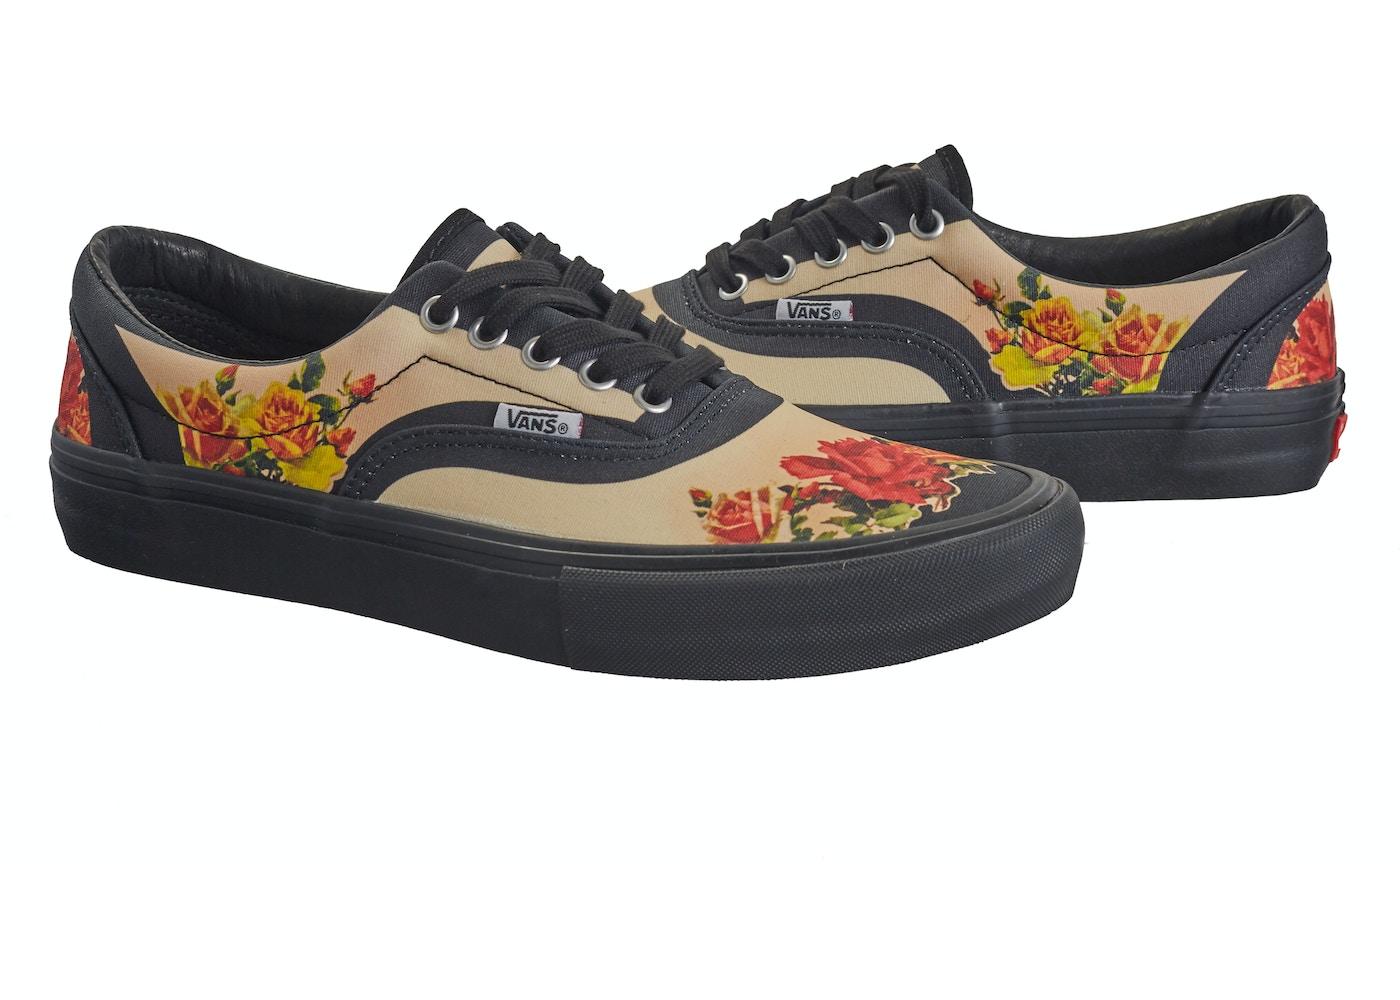 79f7ef9c5d1d Vans Era Supreme Jean Paul Gaultier Peach - VN0A45JAT5Q